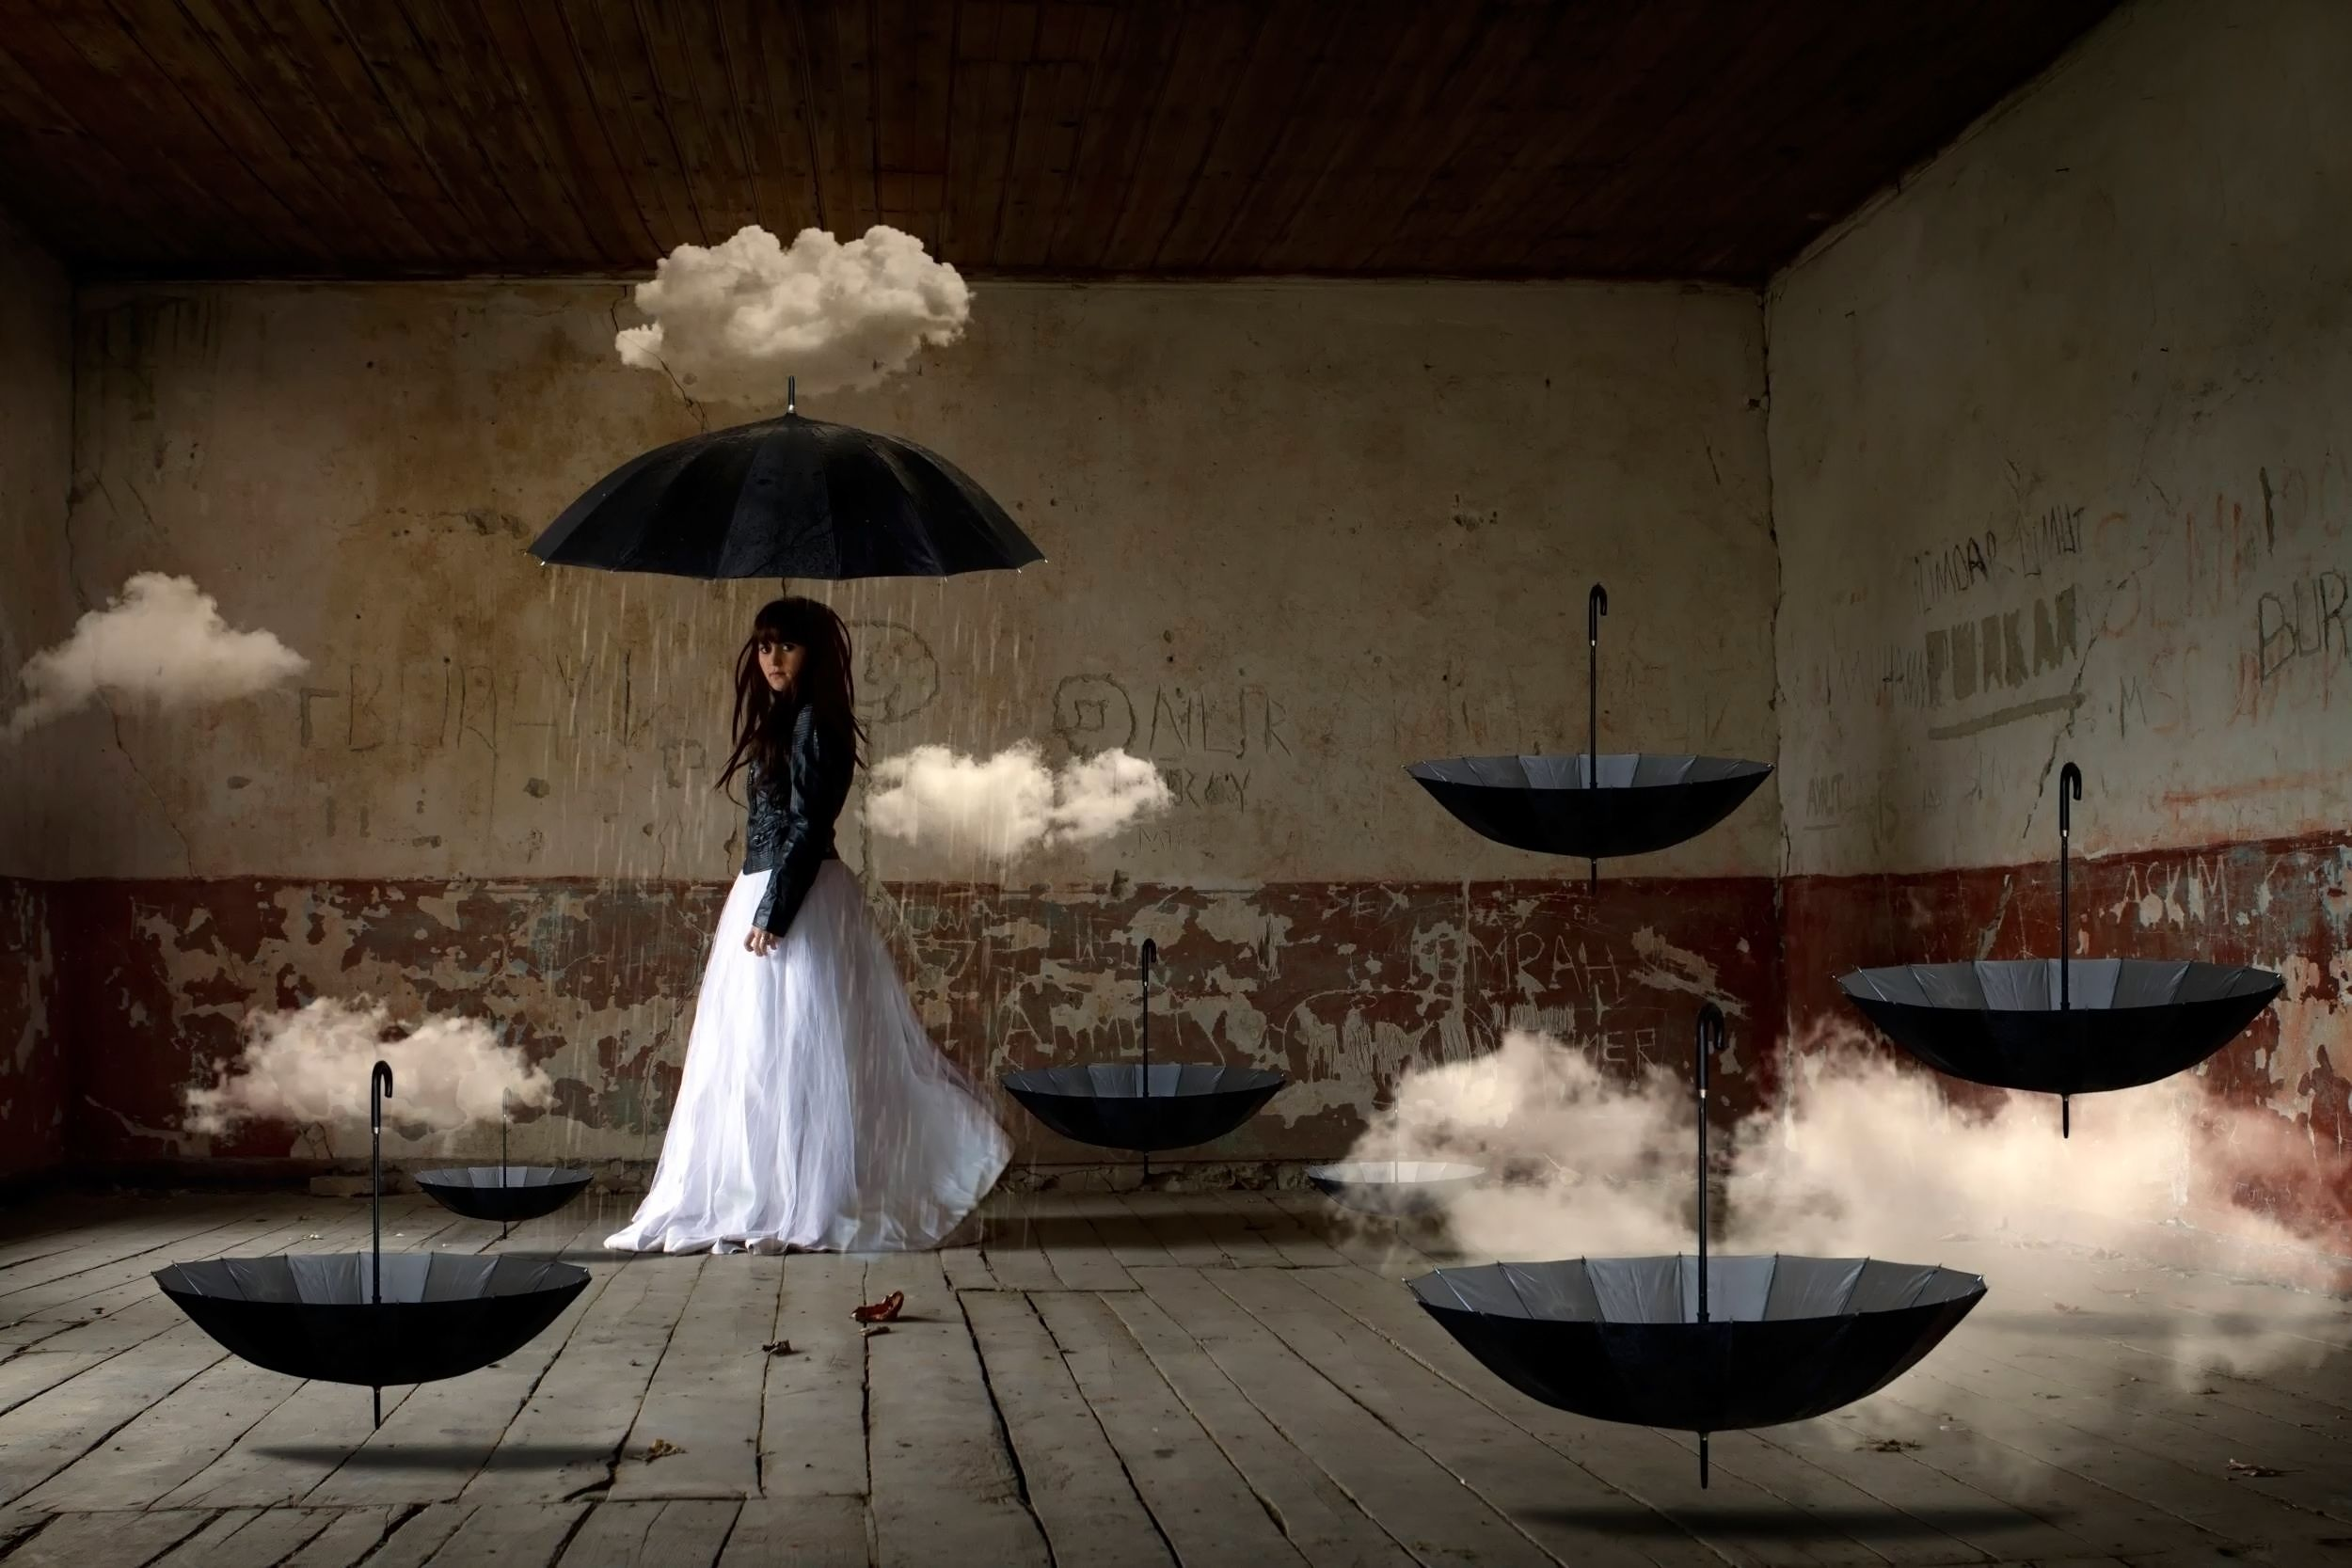 Girl in white dress and umbrella